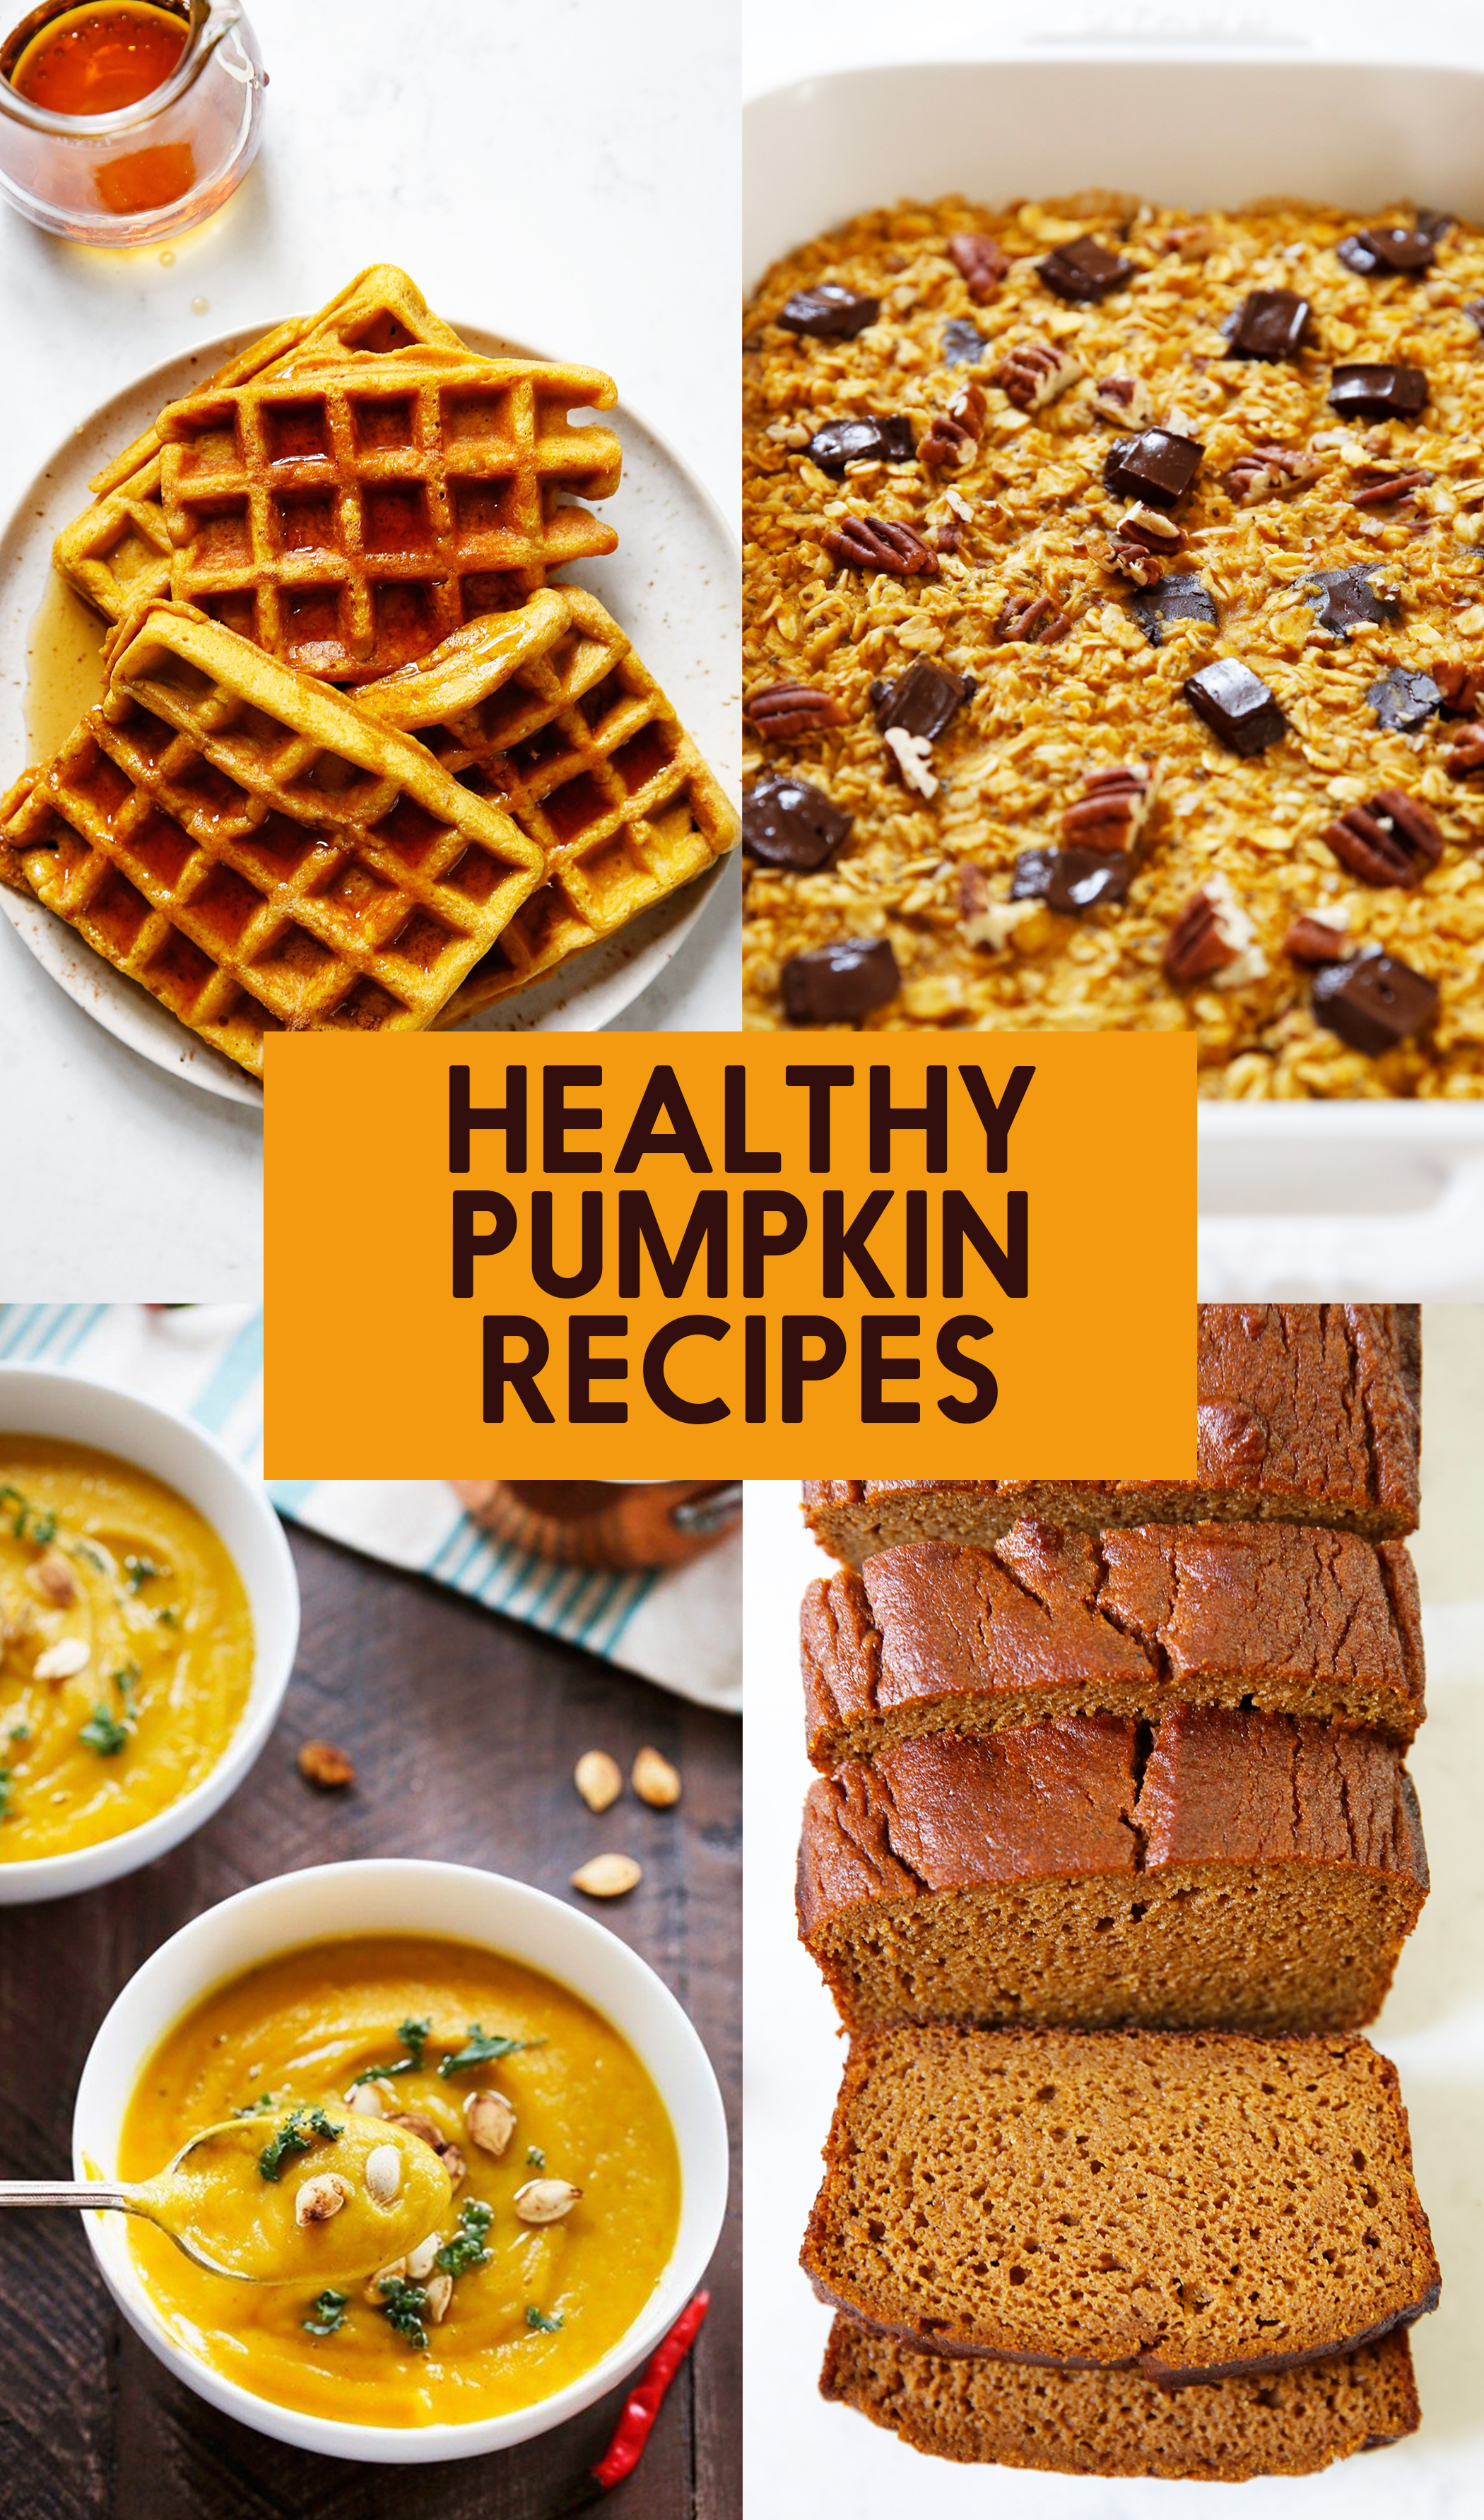 healthy pumpkin recipes graphic